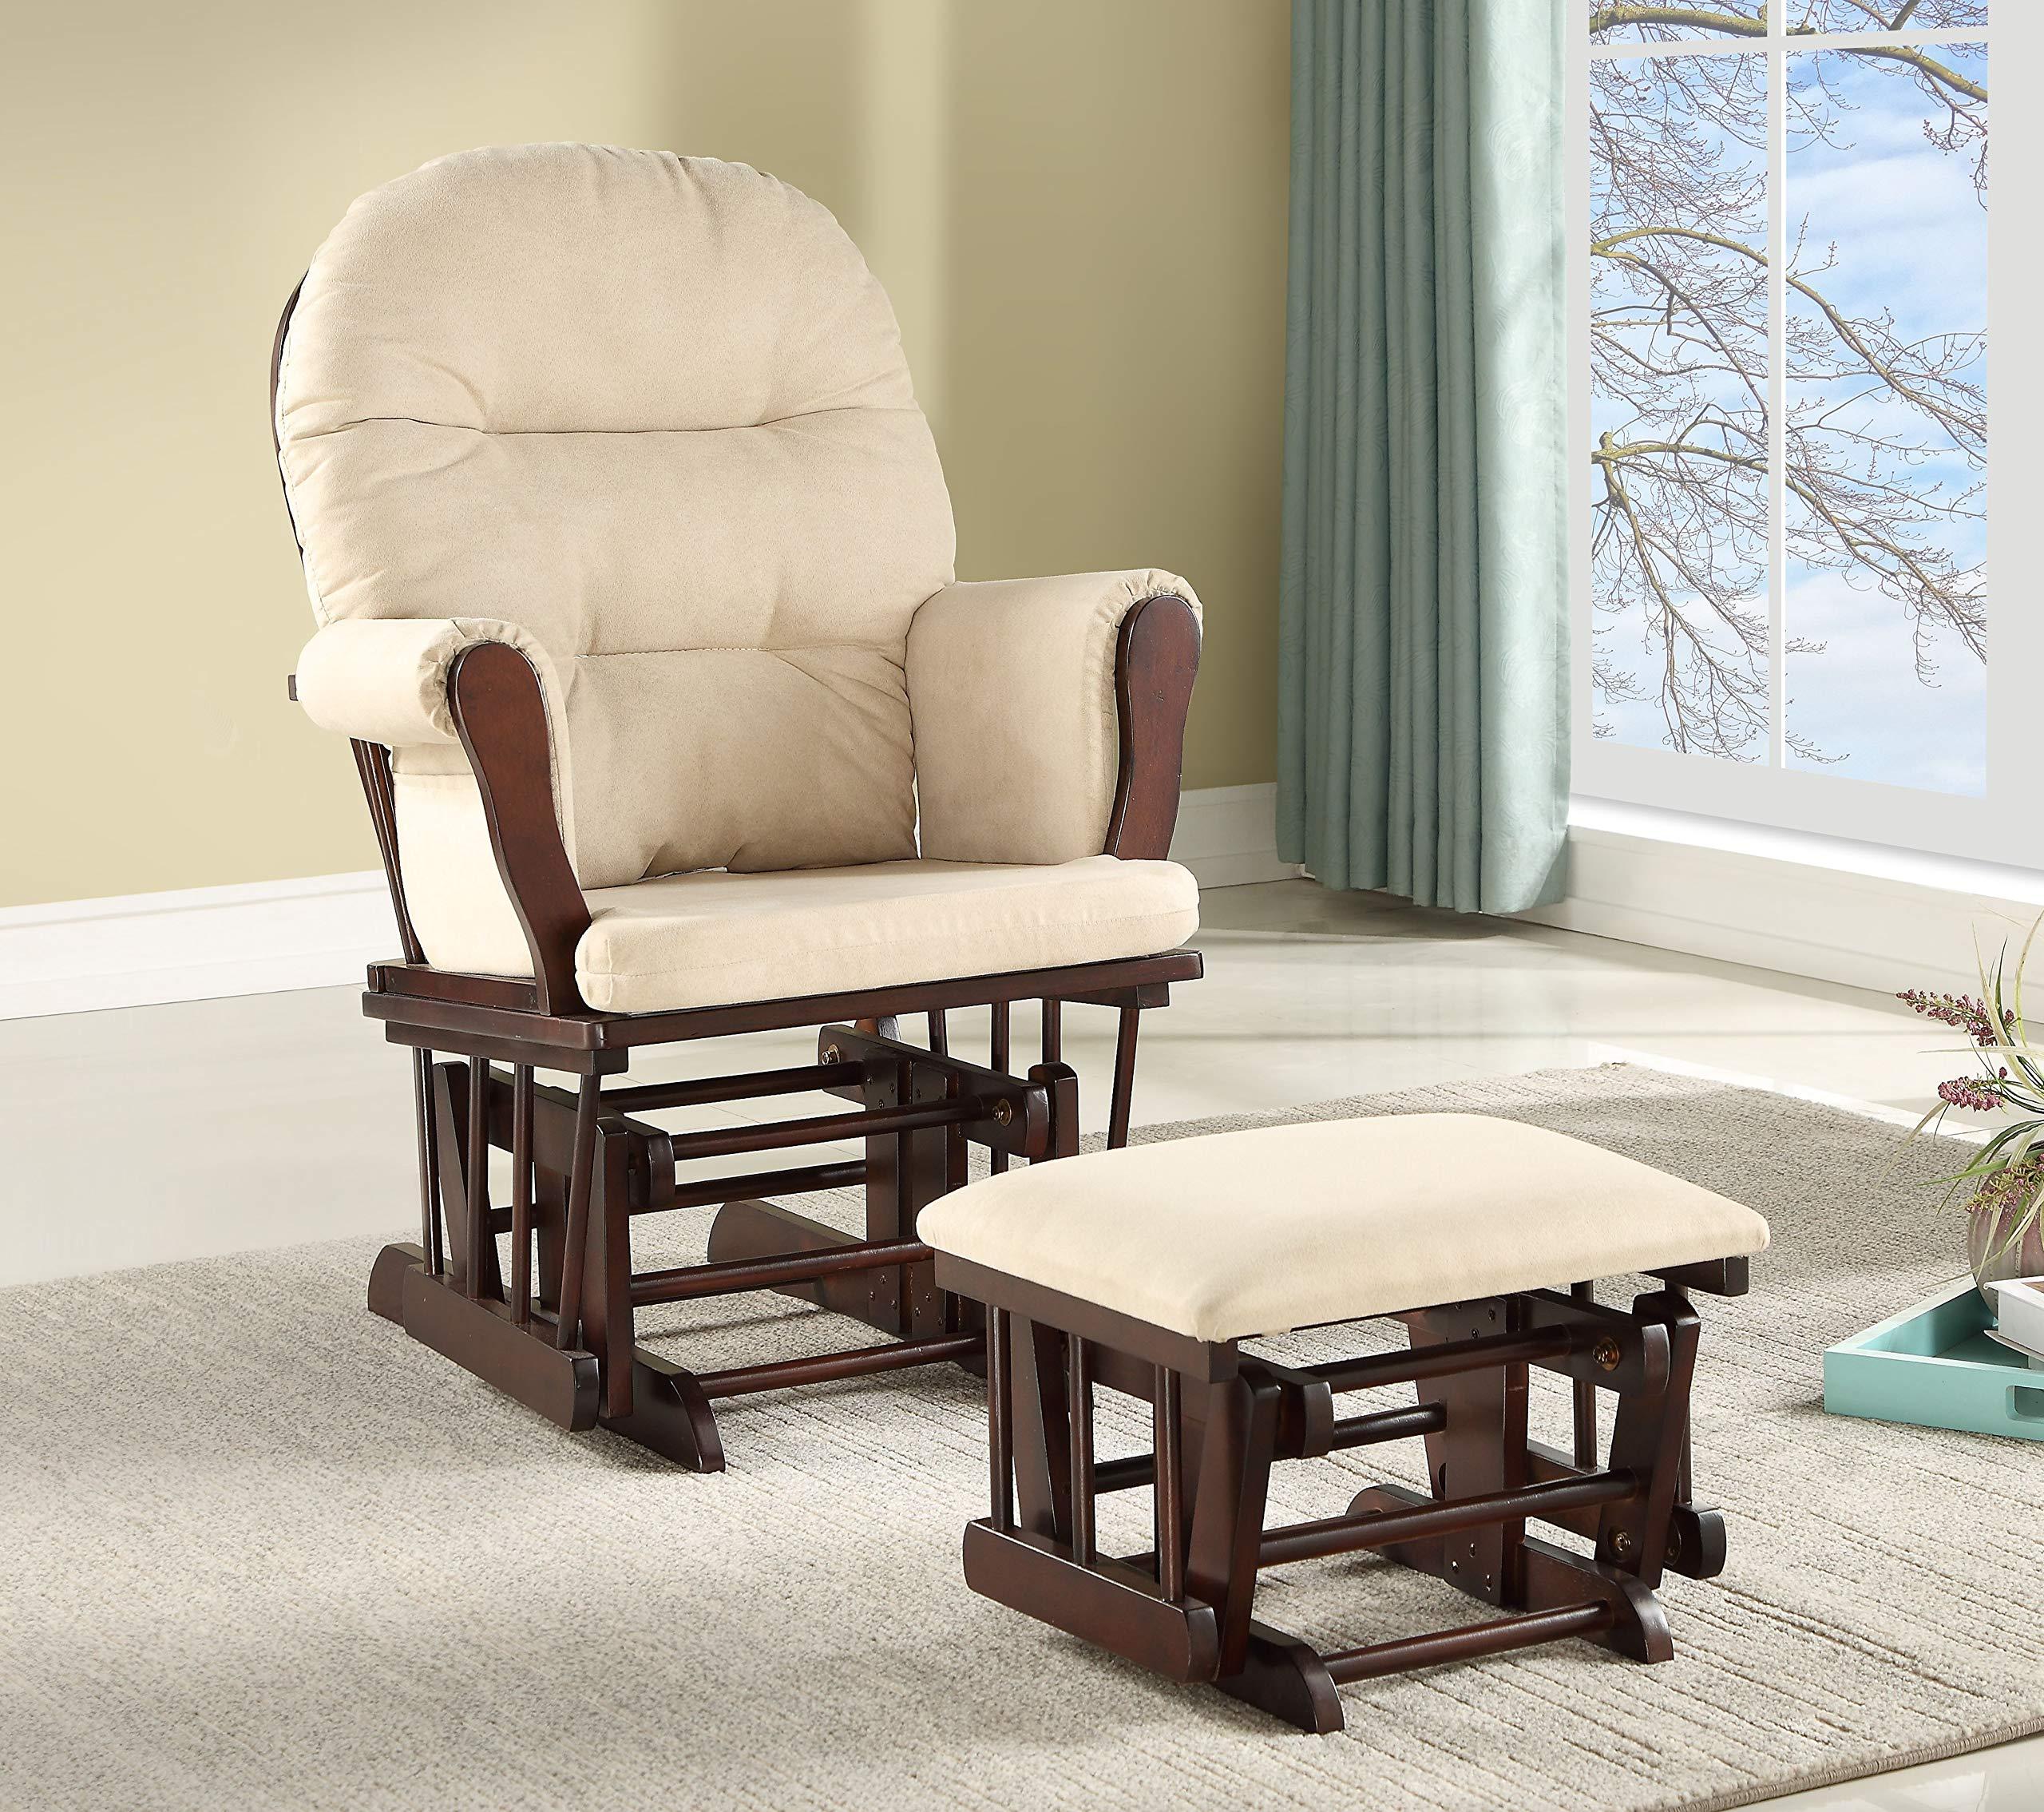 Lennox Furniture Emily Glider Chair & Ottoman Combo, Espresso/Beige, Espresso by Lennox Furniture